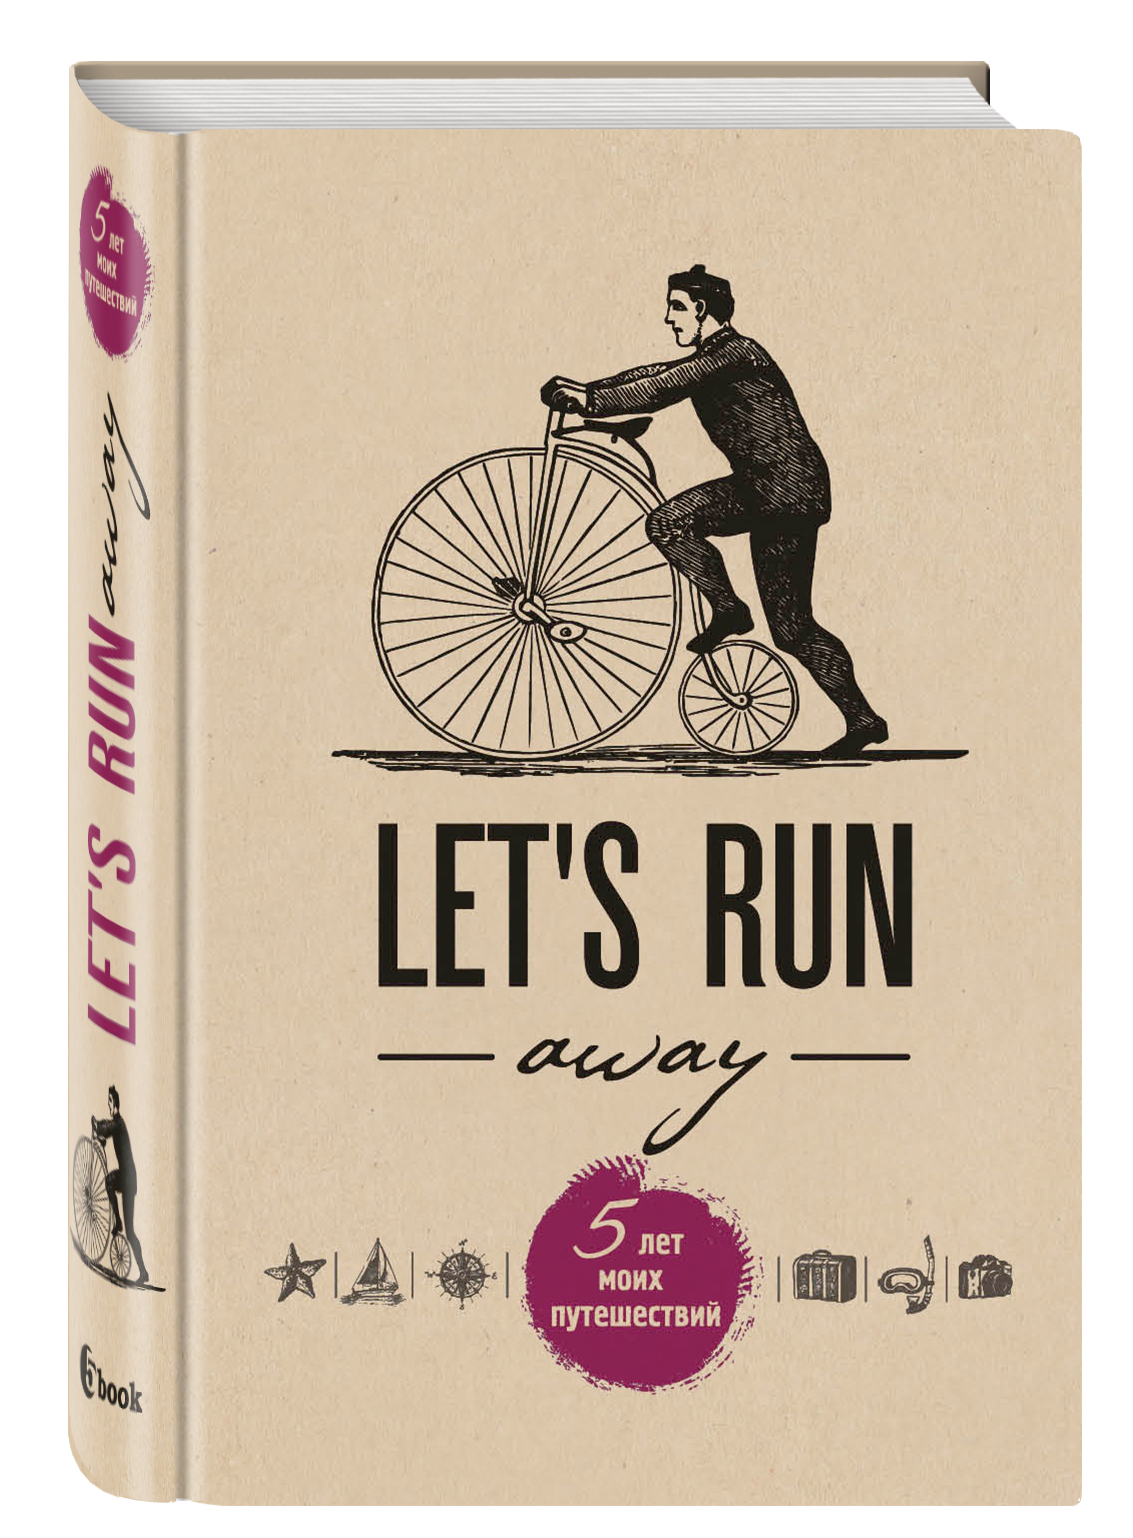 Let\'s Run Away. 5 лет моих путешествий